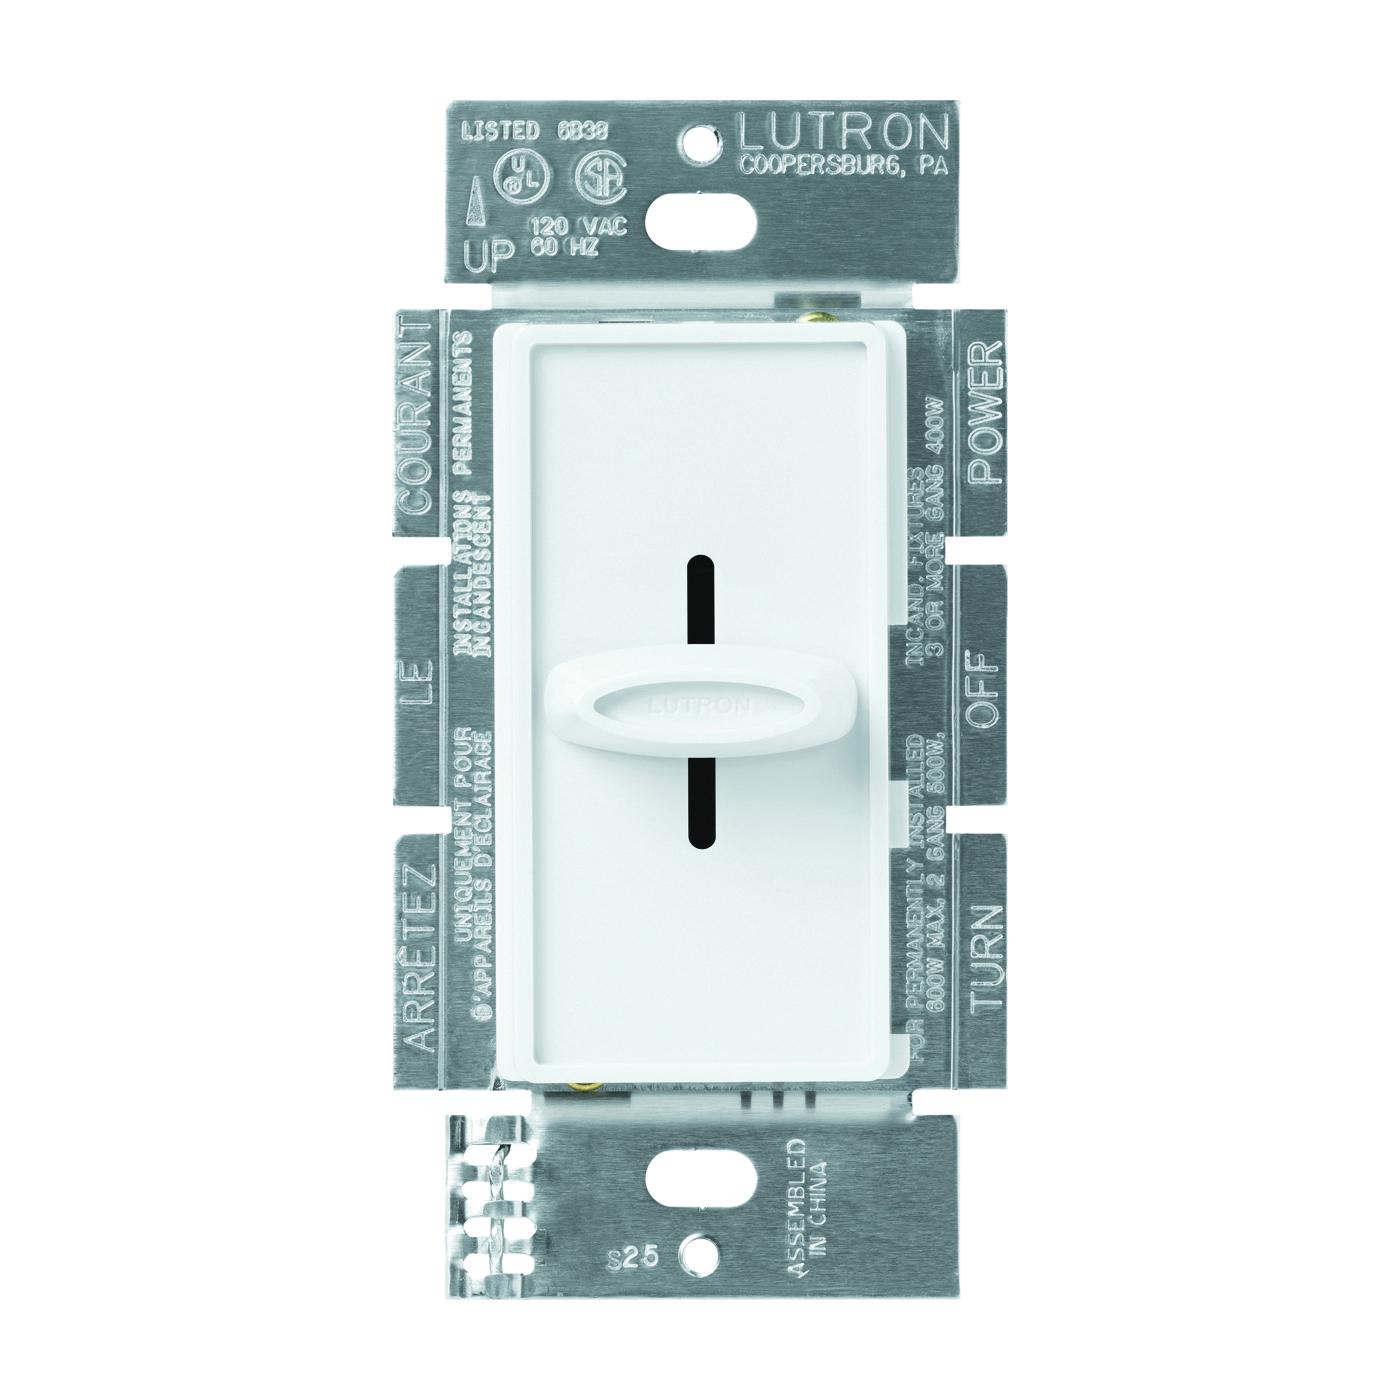 Picture of Lutron Skylark S-600H-WH Dimmer, 5 A, 120 V, 600 W, Halogen, Incandescent Lamp, White